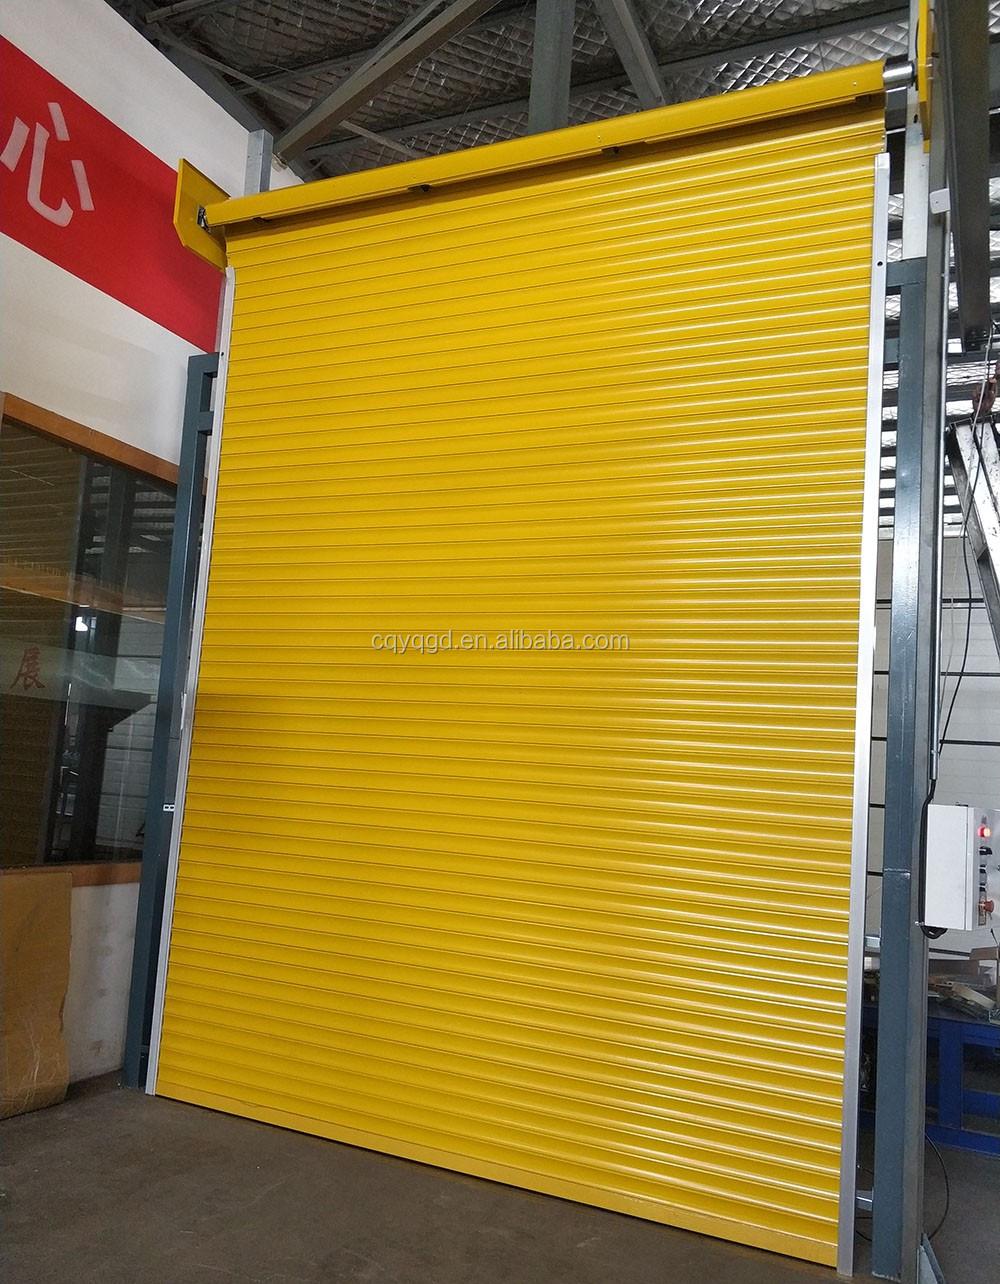 Factory Direct Sale Long Lasting Steel Garage Roller